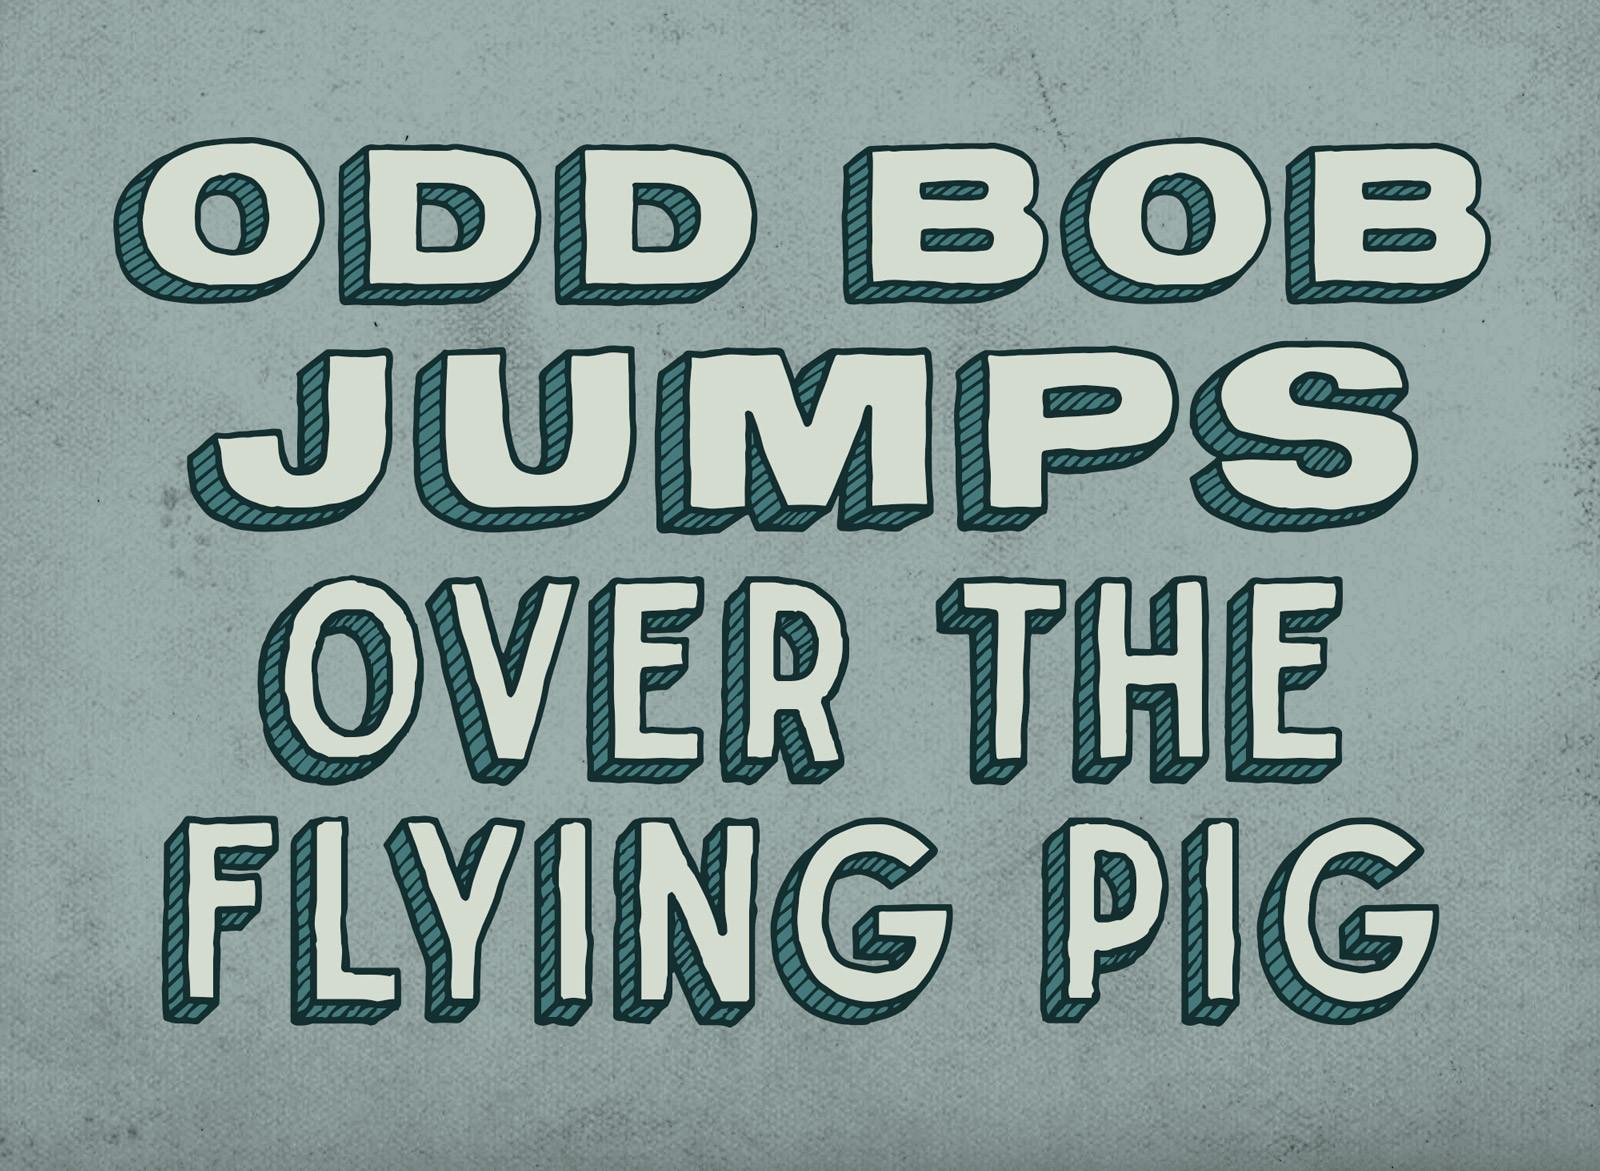 odd-bob-flying-pig-hand-drawn-font-typef